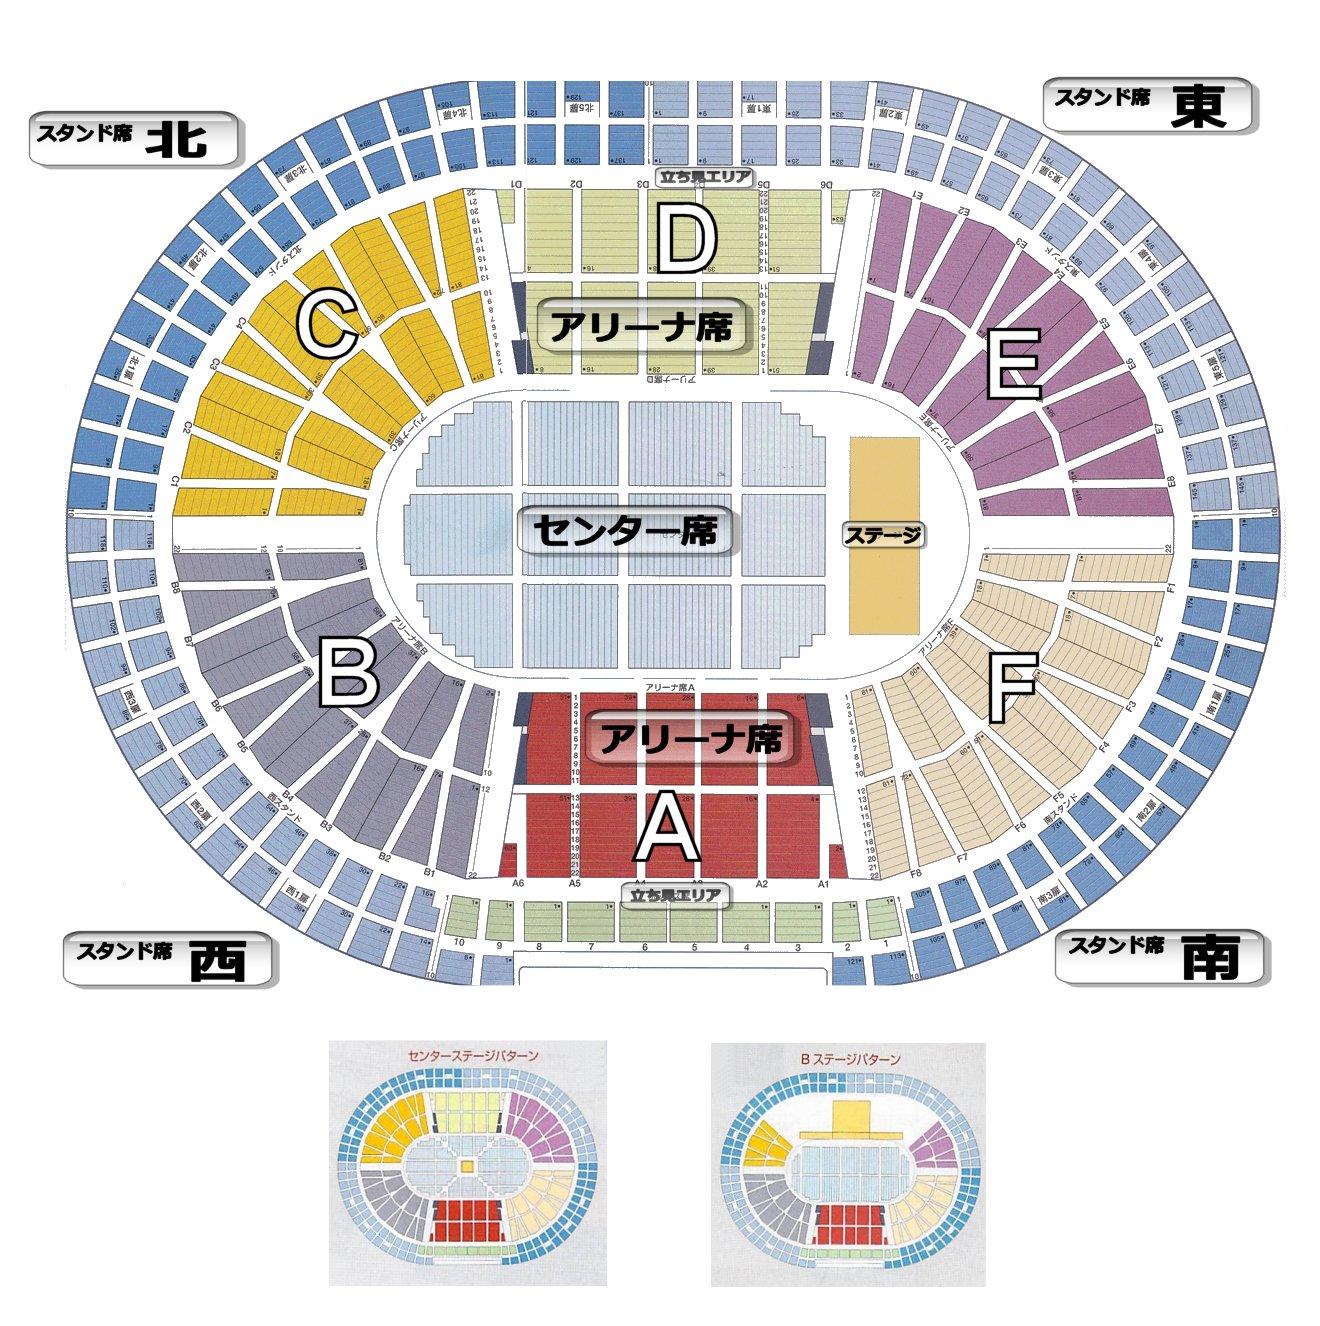 横浜アリーナ 全体詳細座席表